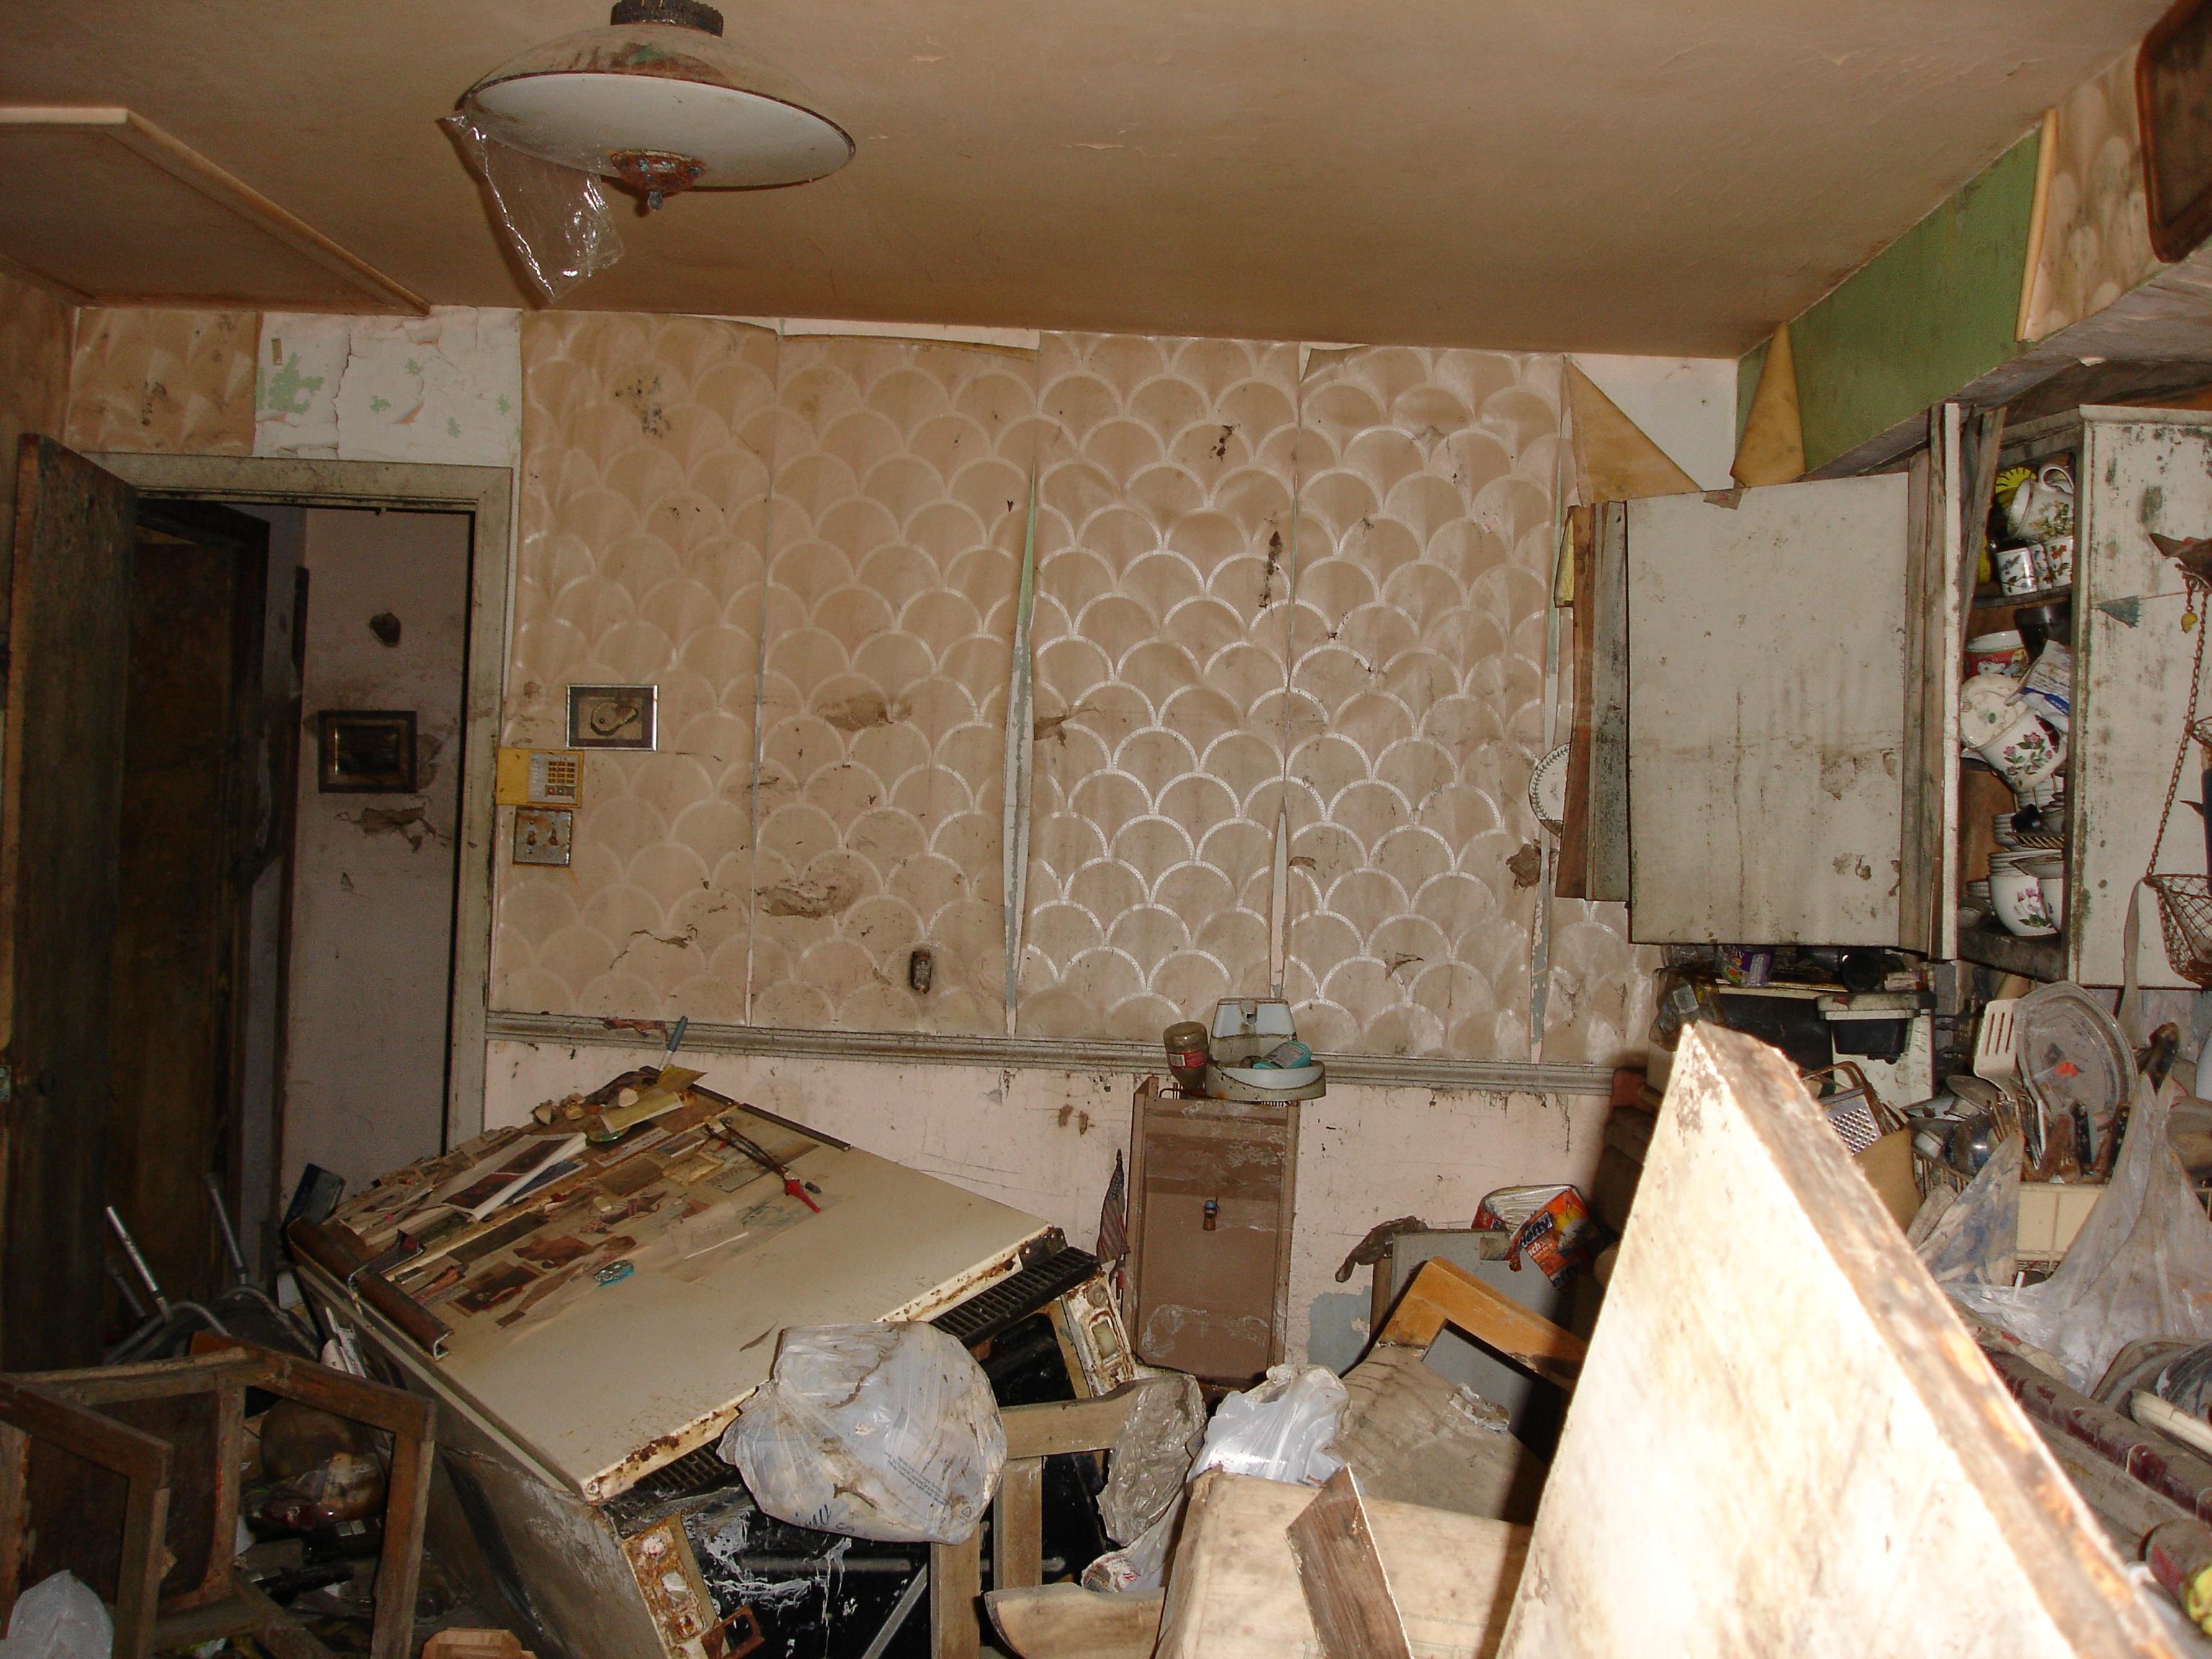 My Flooded Kitchen by wolfepaw